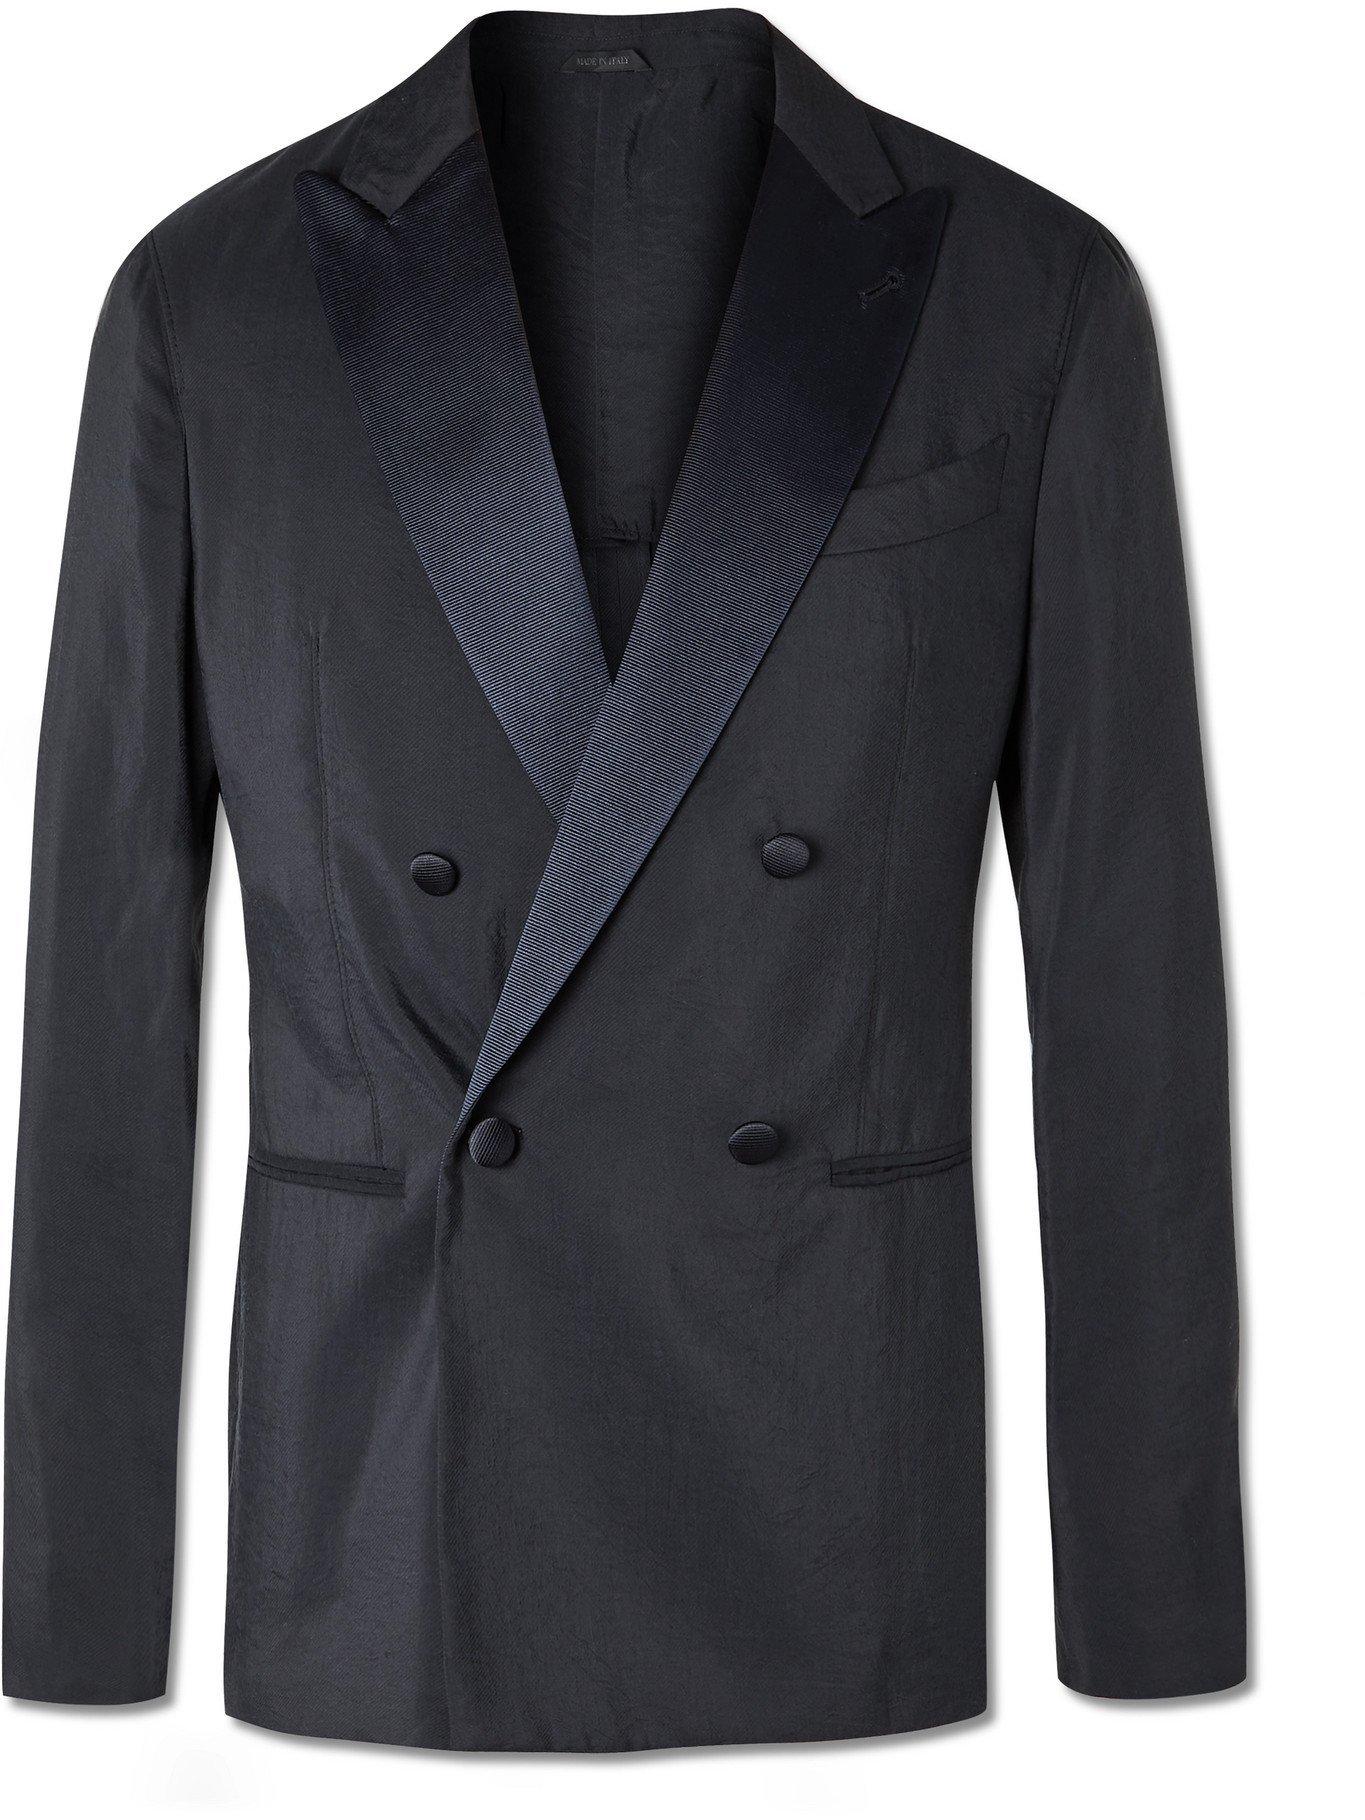 GIORGIO ARMANI - Slim-Fit Double-Breasted Faille-Trimmed Silk-Blend Twill Tuxedo Jacket - Blue - IT 46